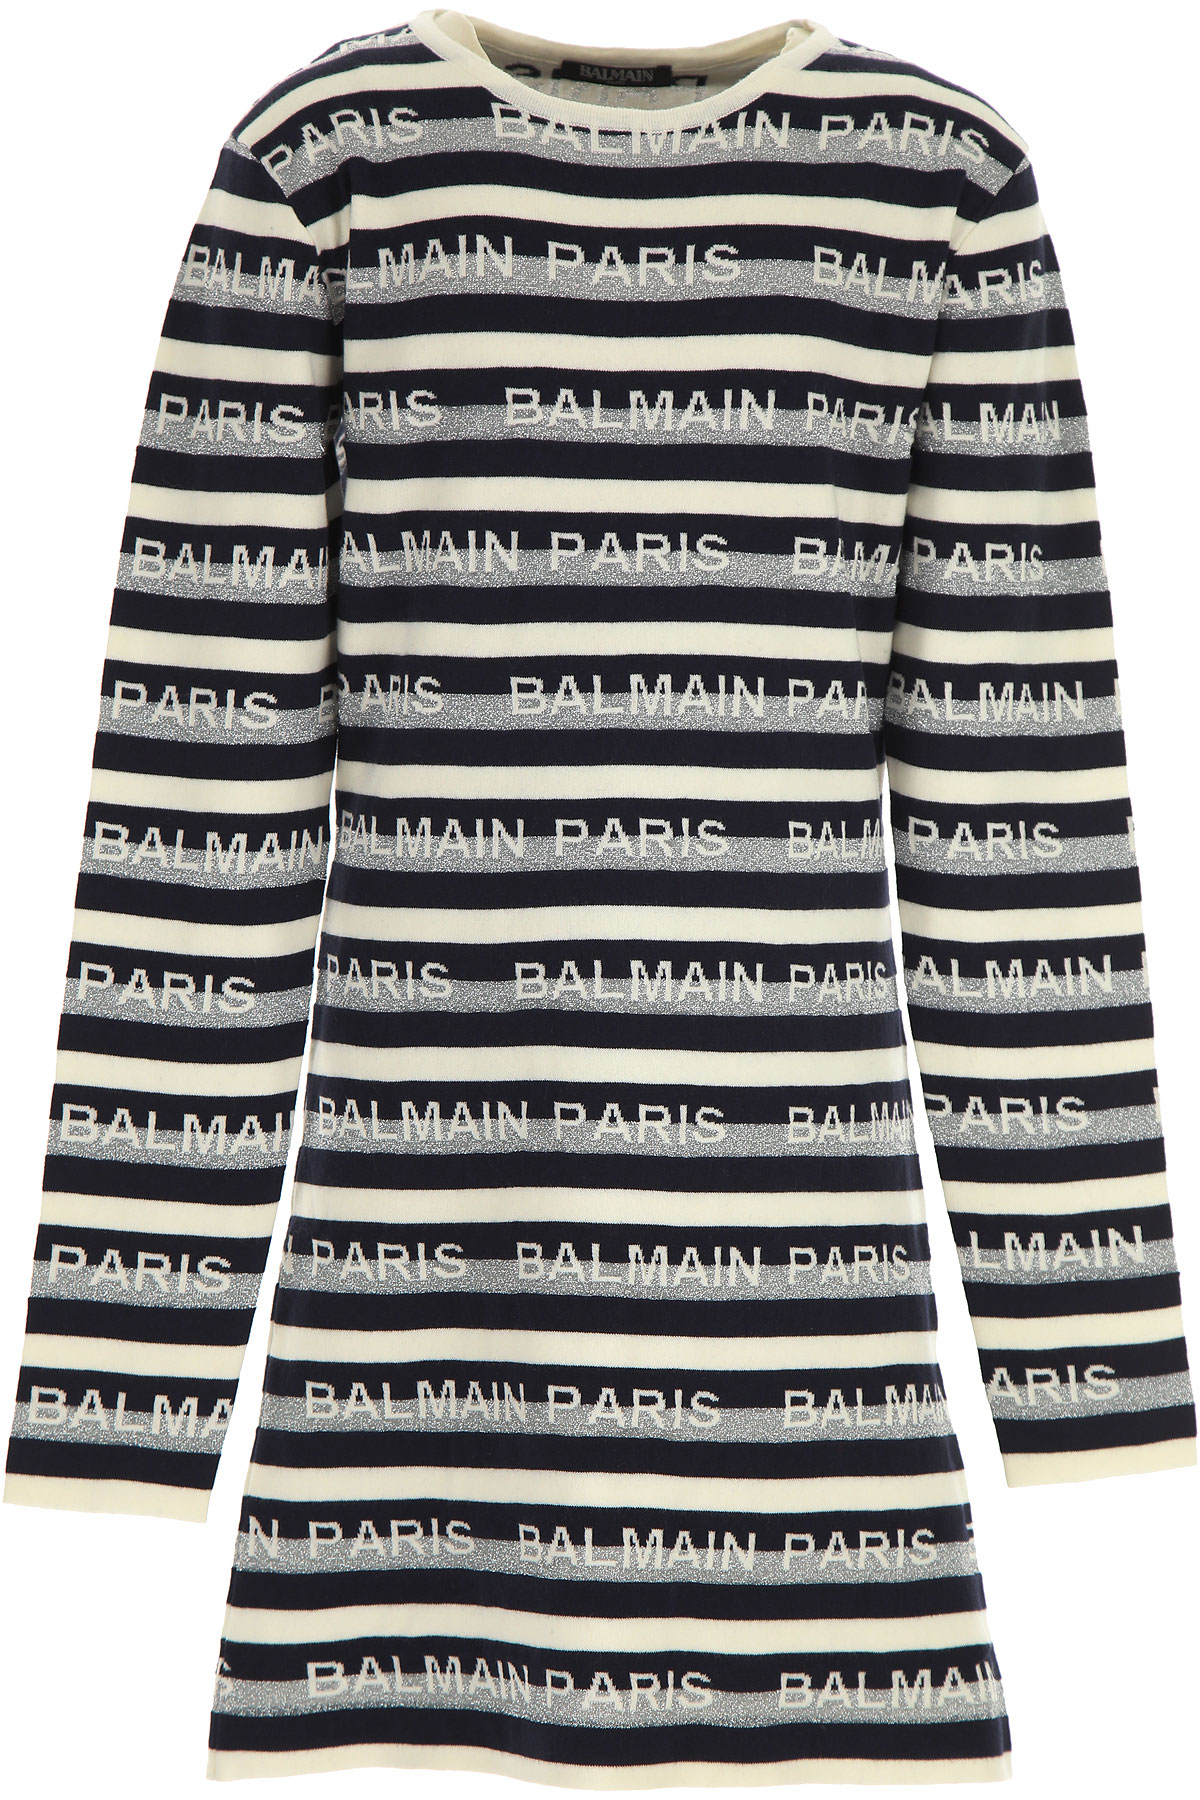 Balmain Girls Dress On Sale, White, Cotton, 2019, 14Y 16Y